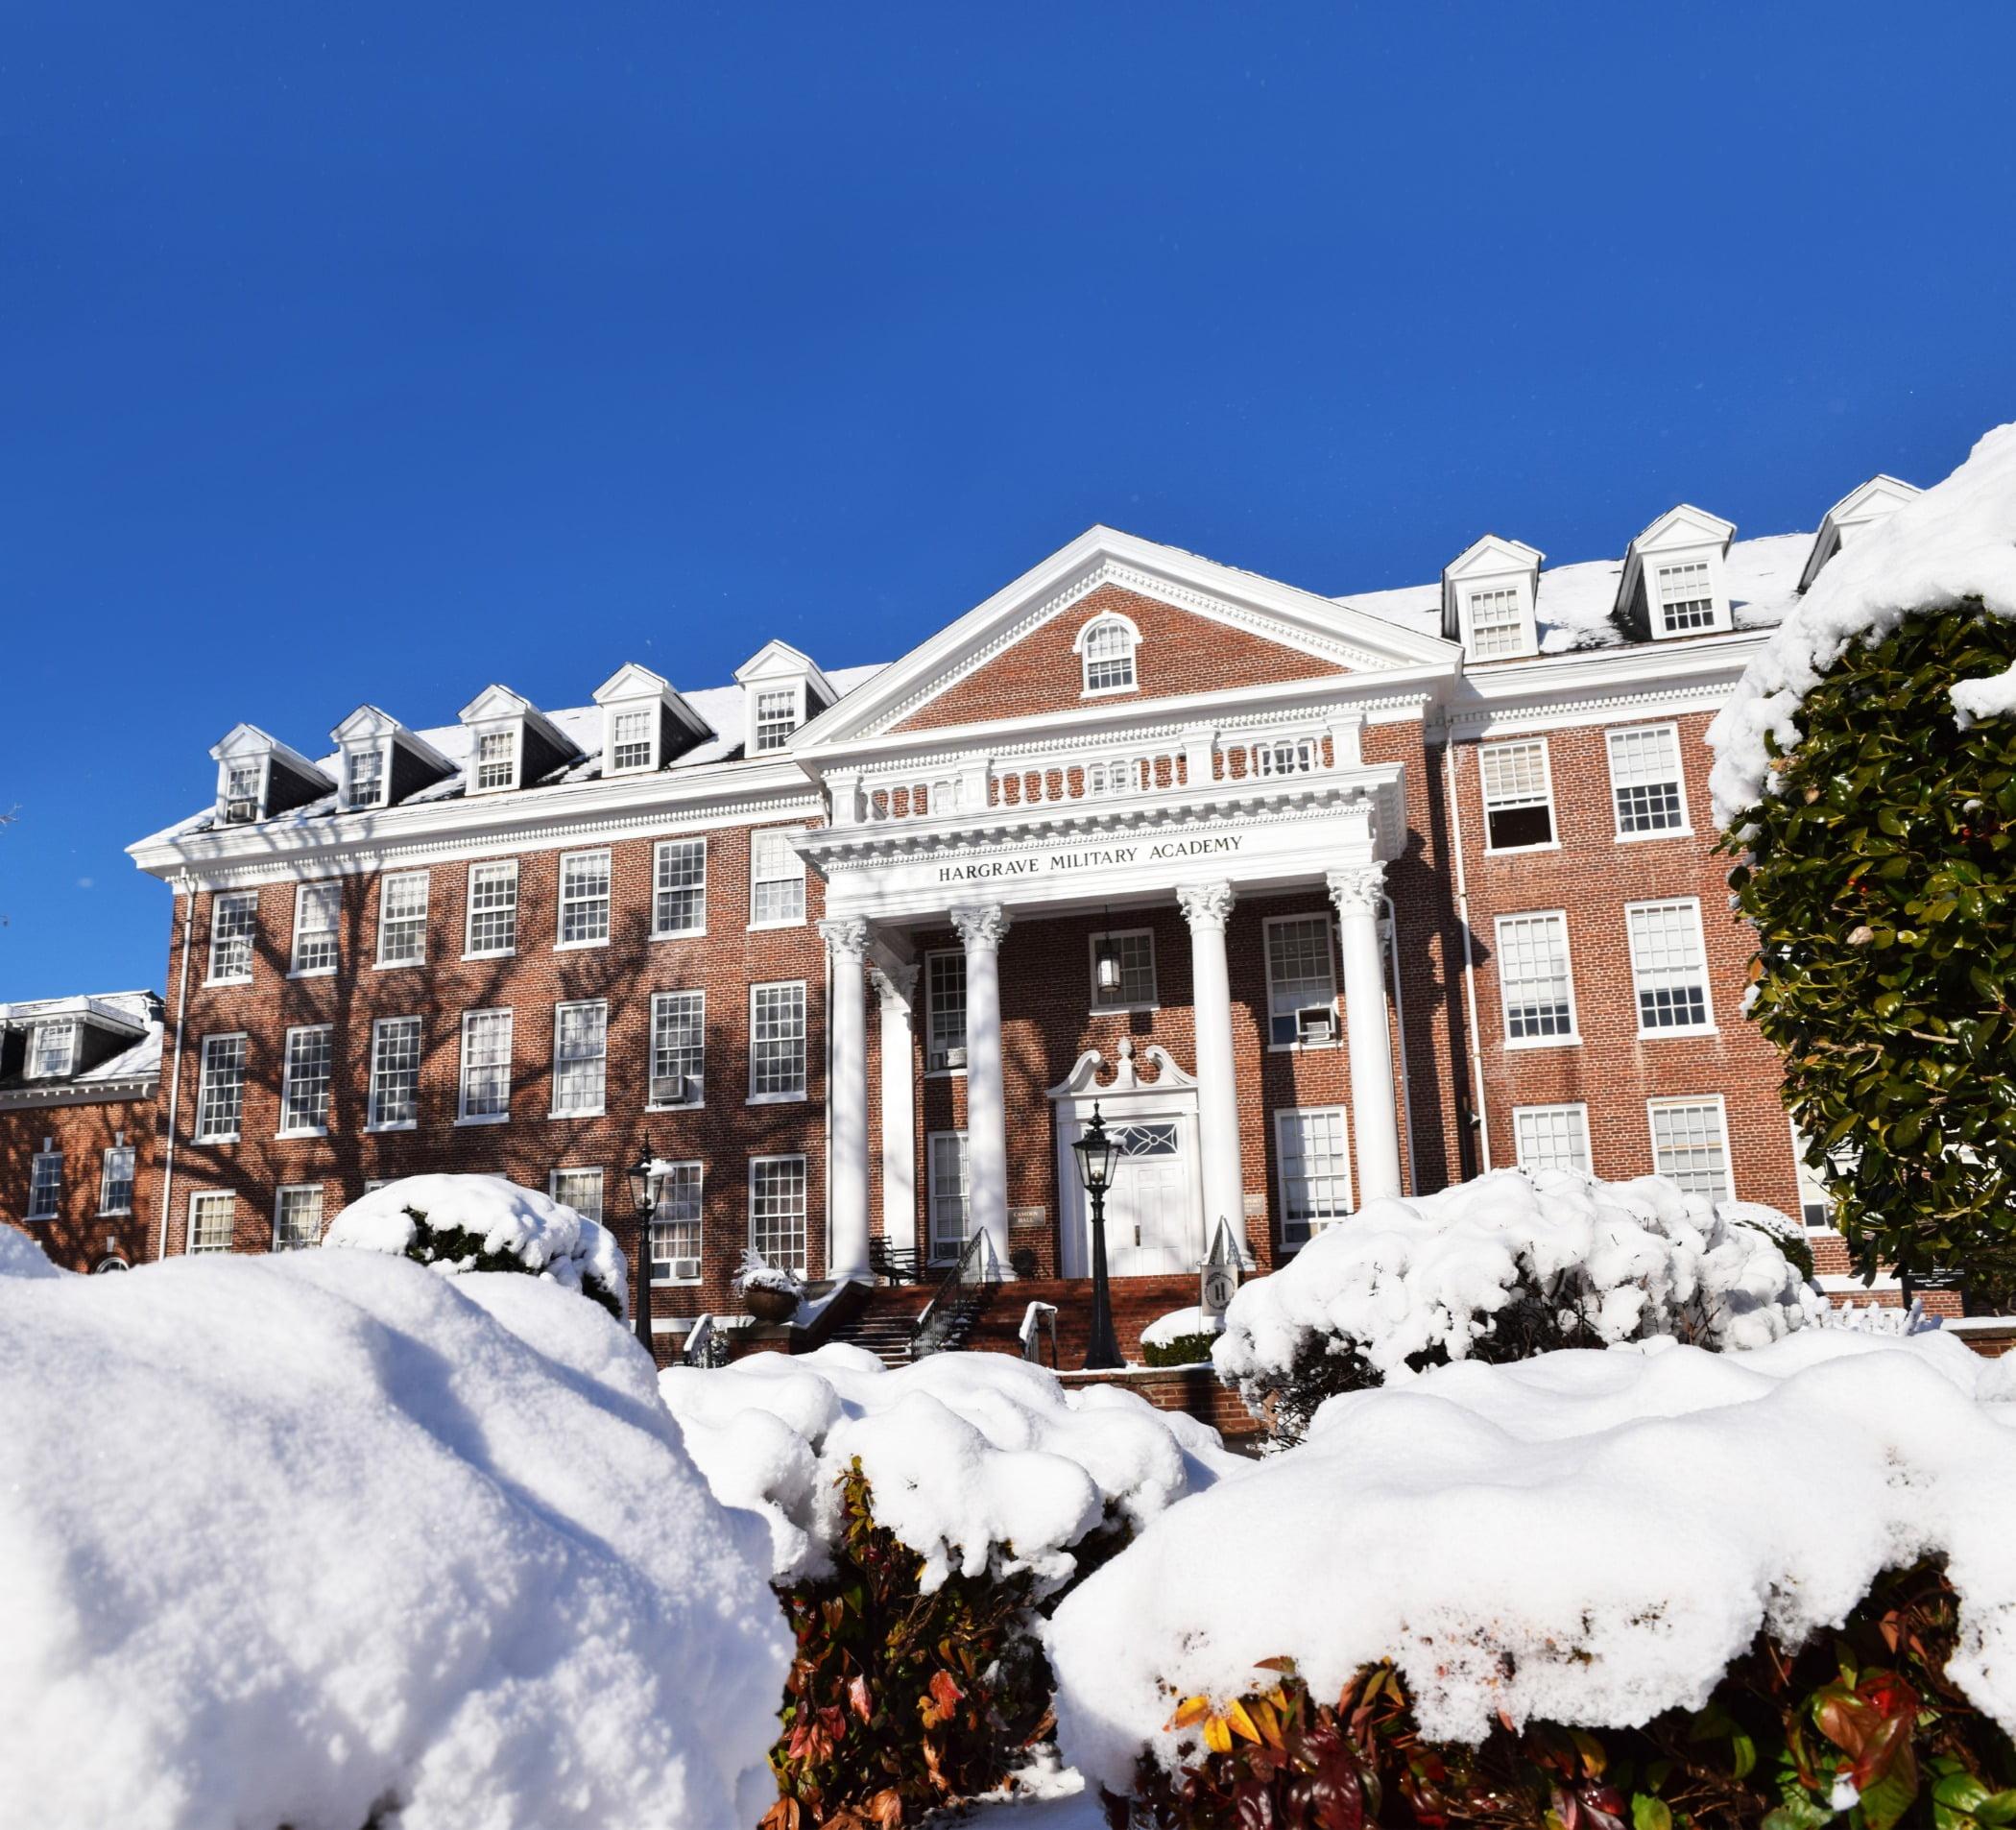 Sky, Plant, Building, Snow